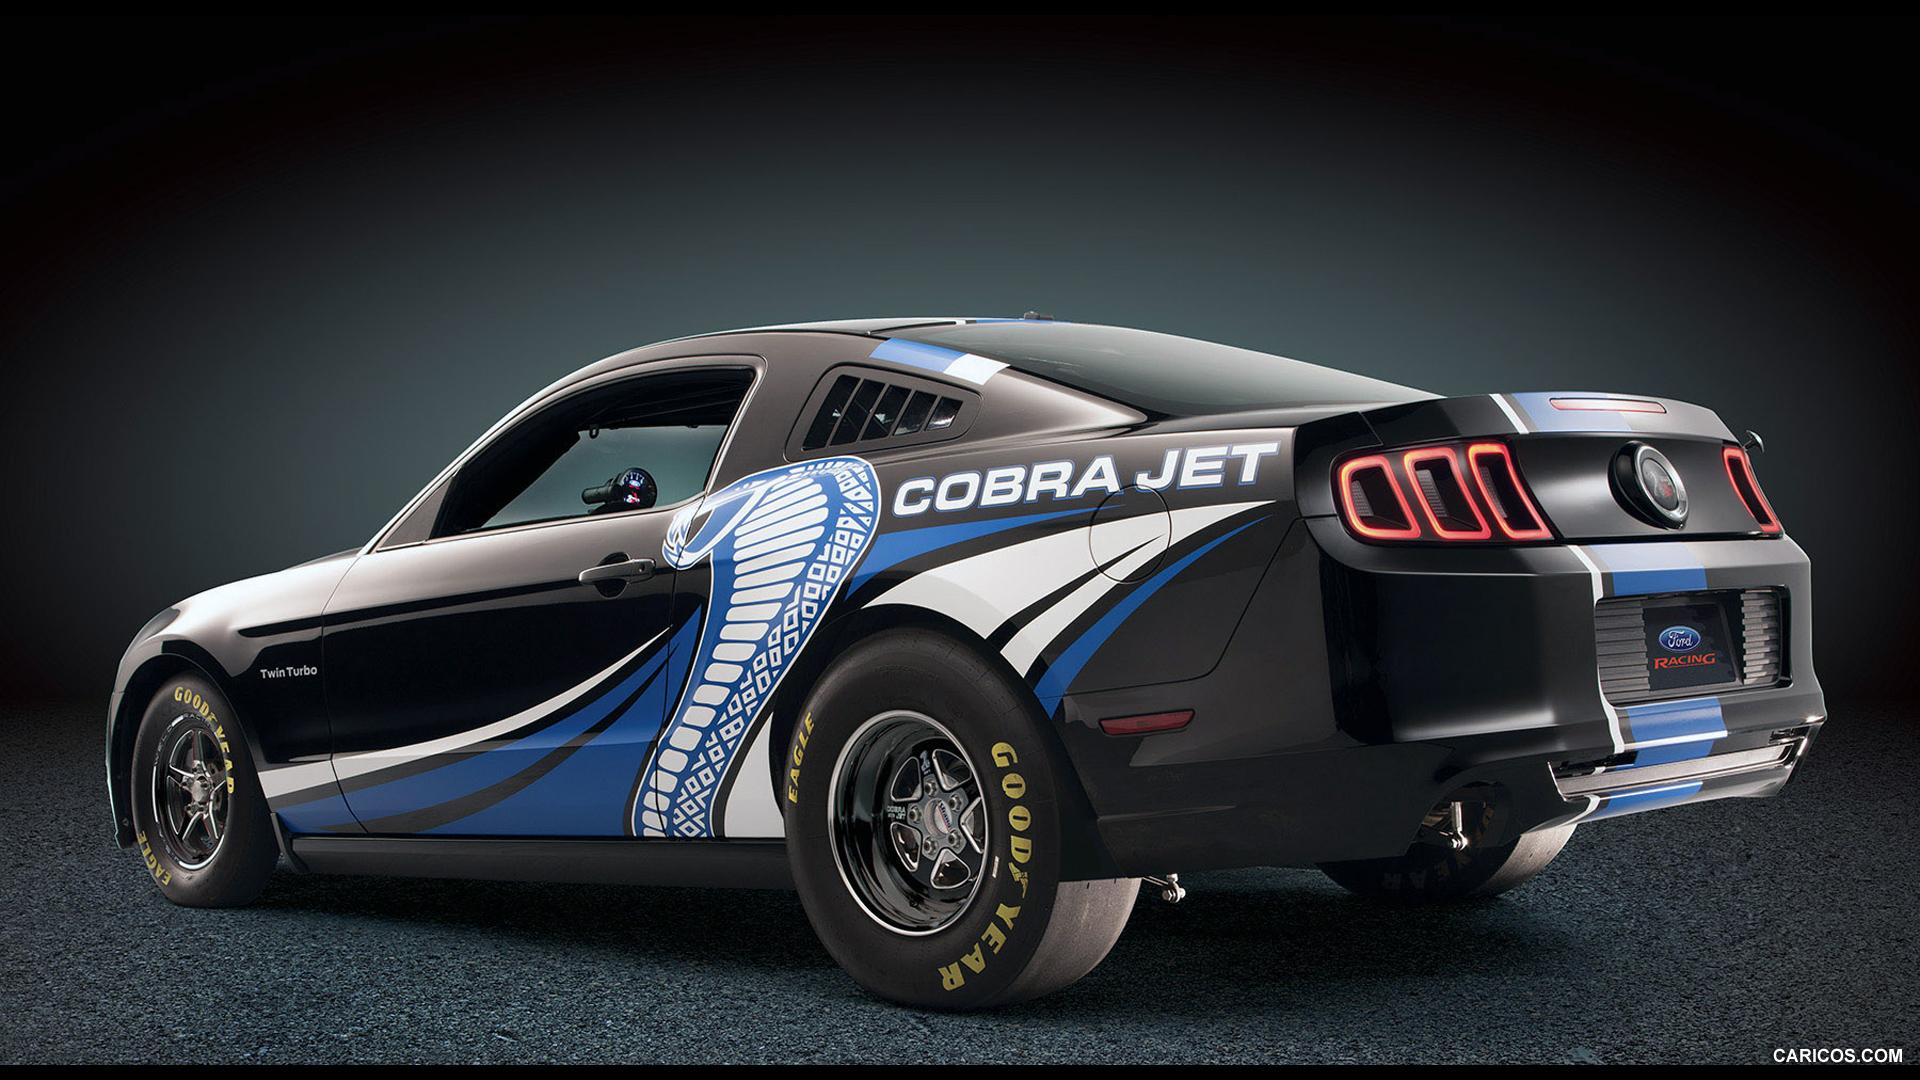 2012 Ford Mustang Cobra Jet Twin Turbo Concept Black   Rear HD 1920x1080